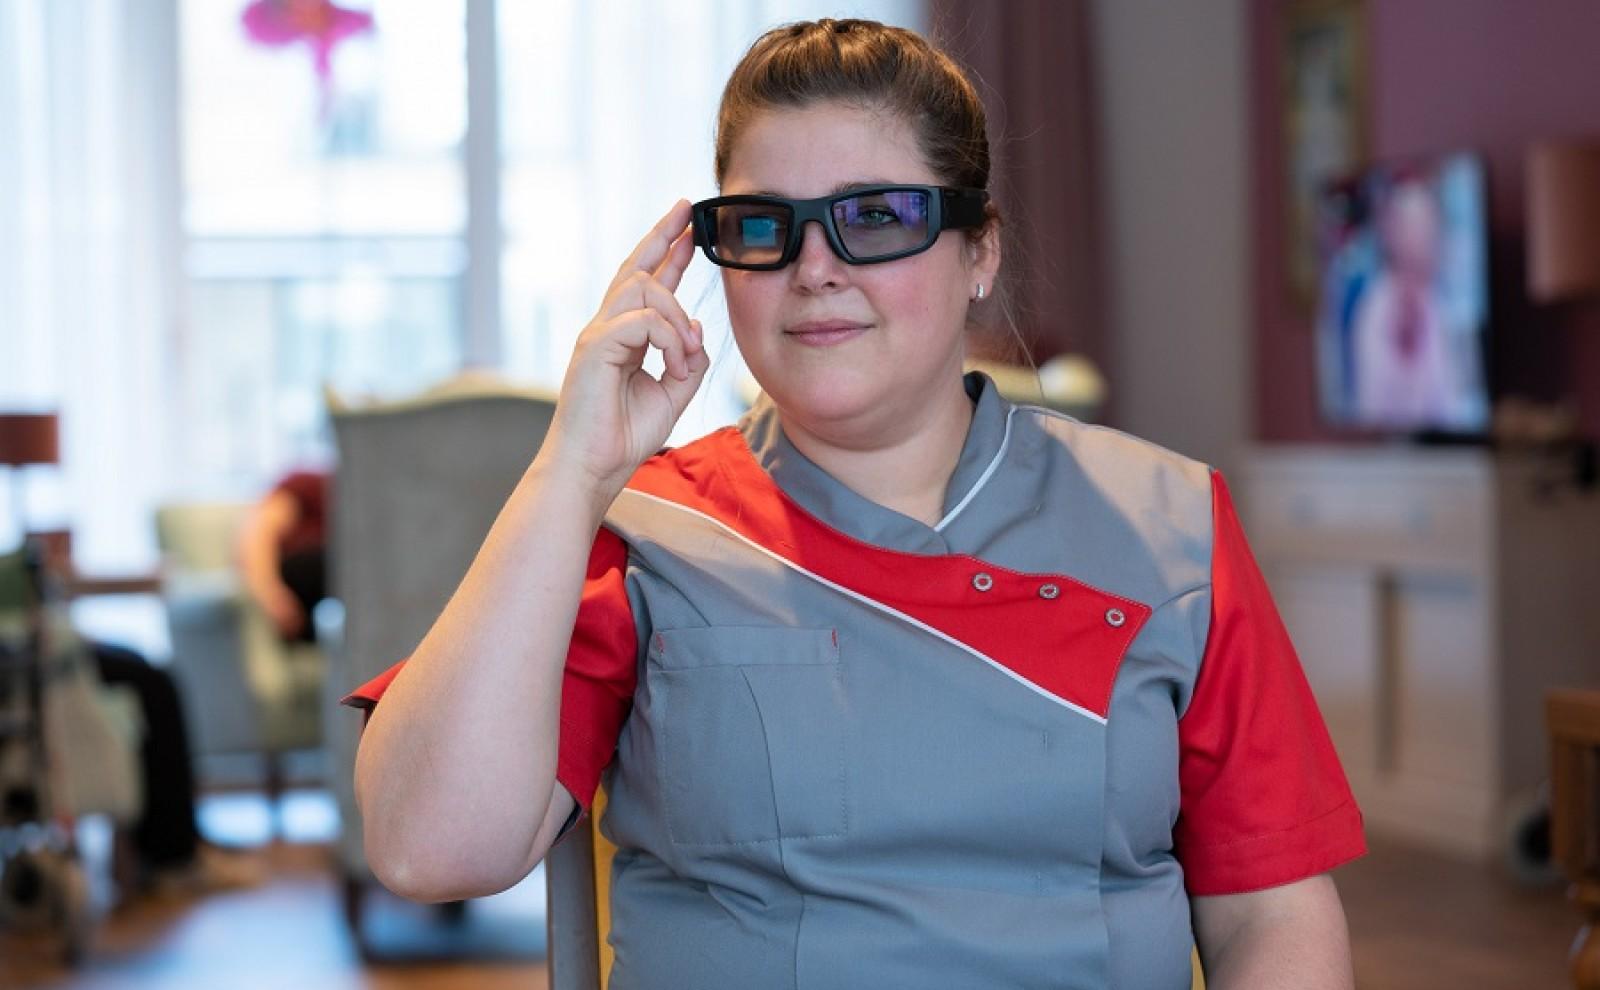 zorgprofessional draagt smartglass